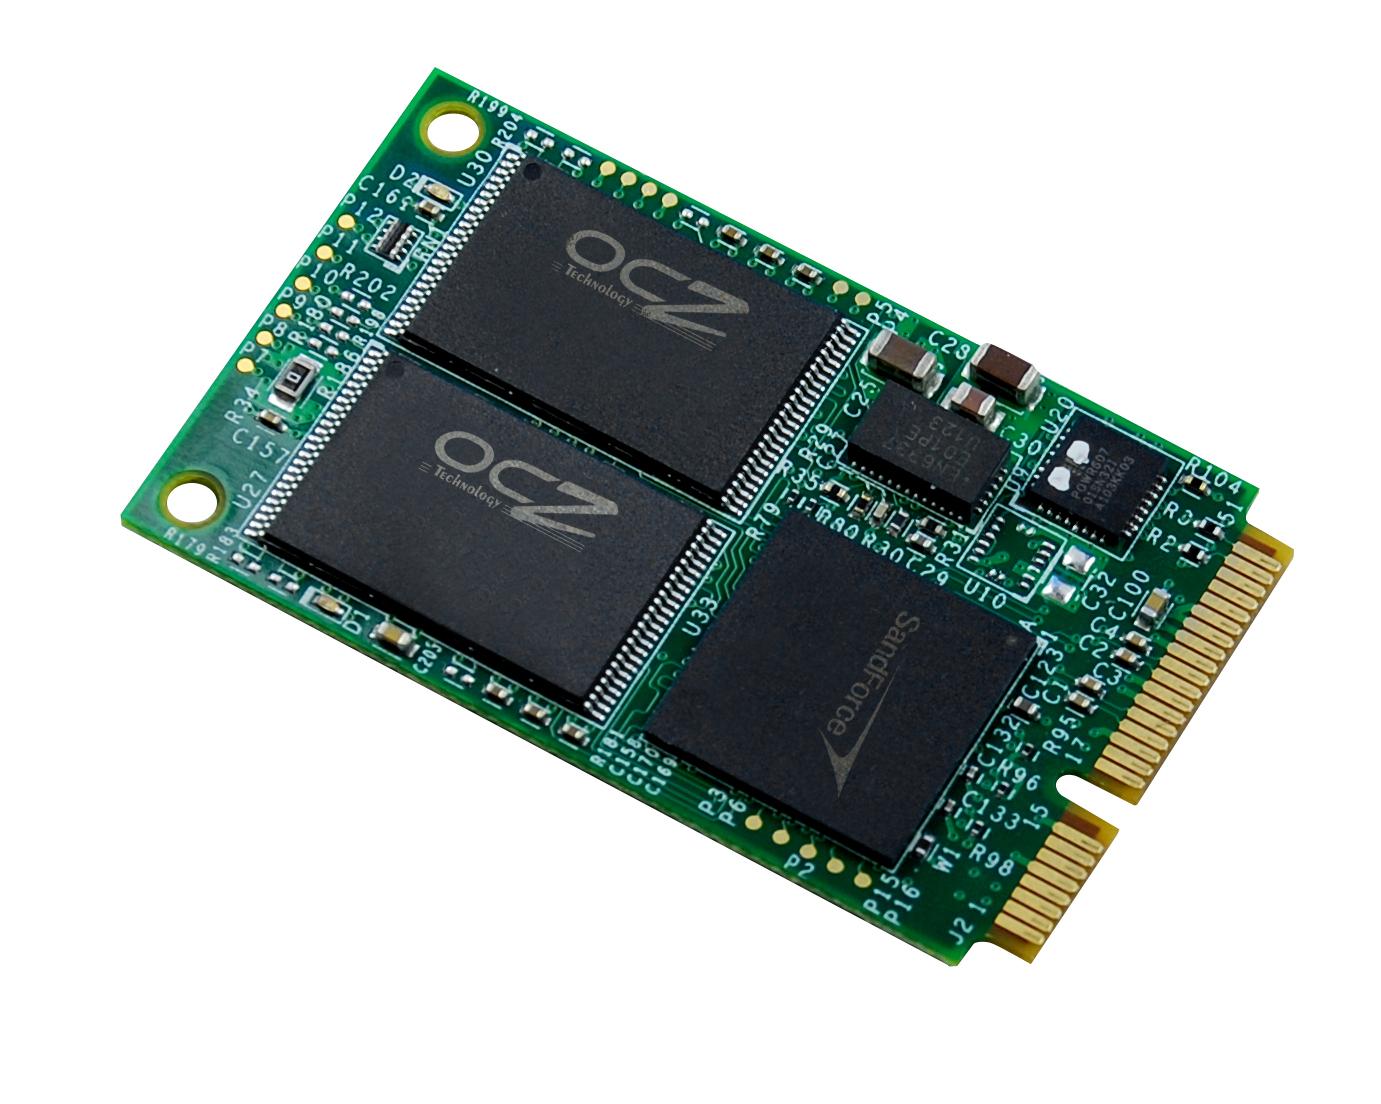 OCZ_nocti_SSD